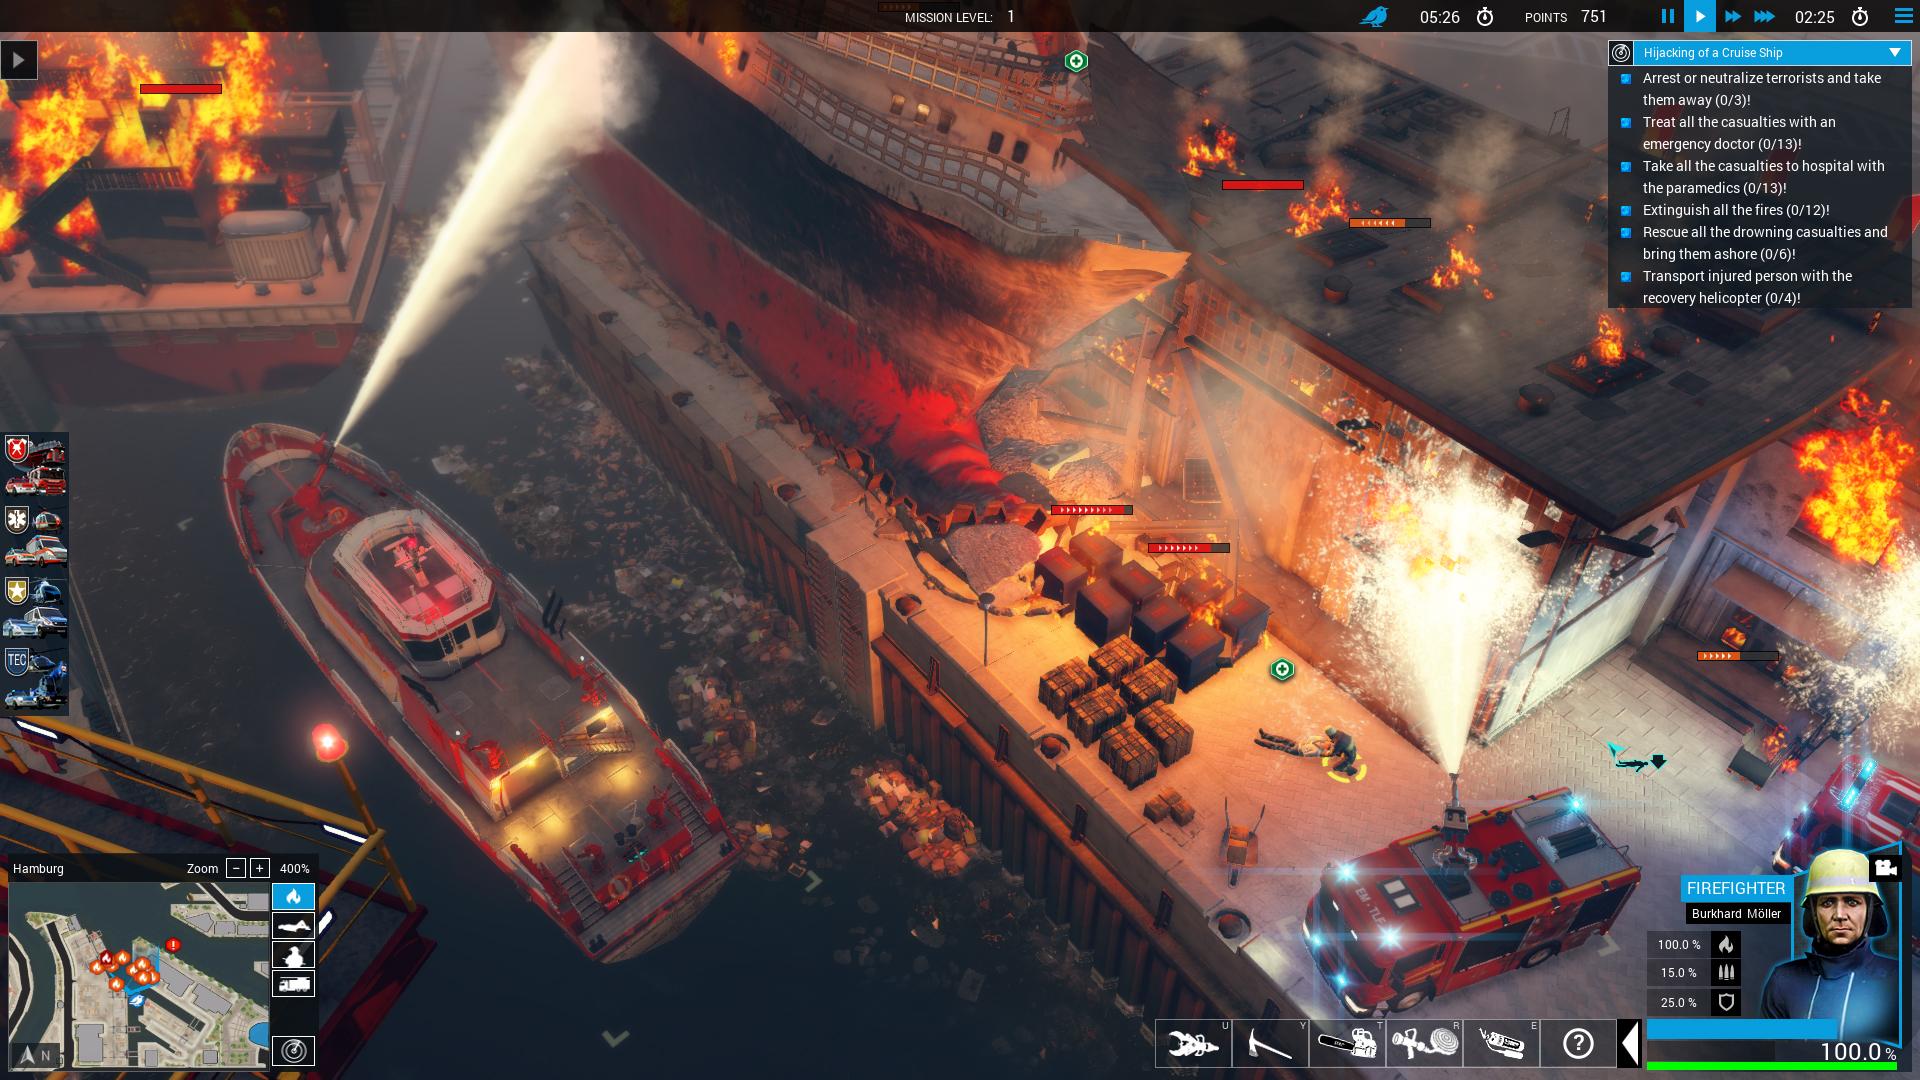 Emergency 2017 Screenshot 1